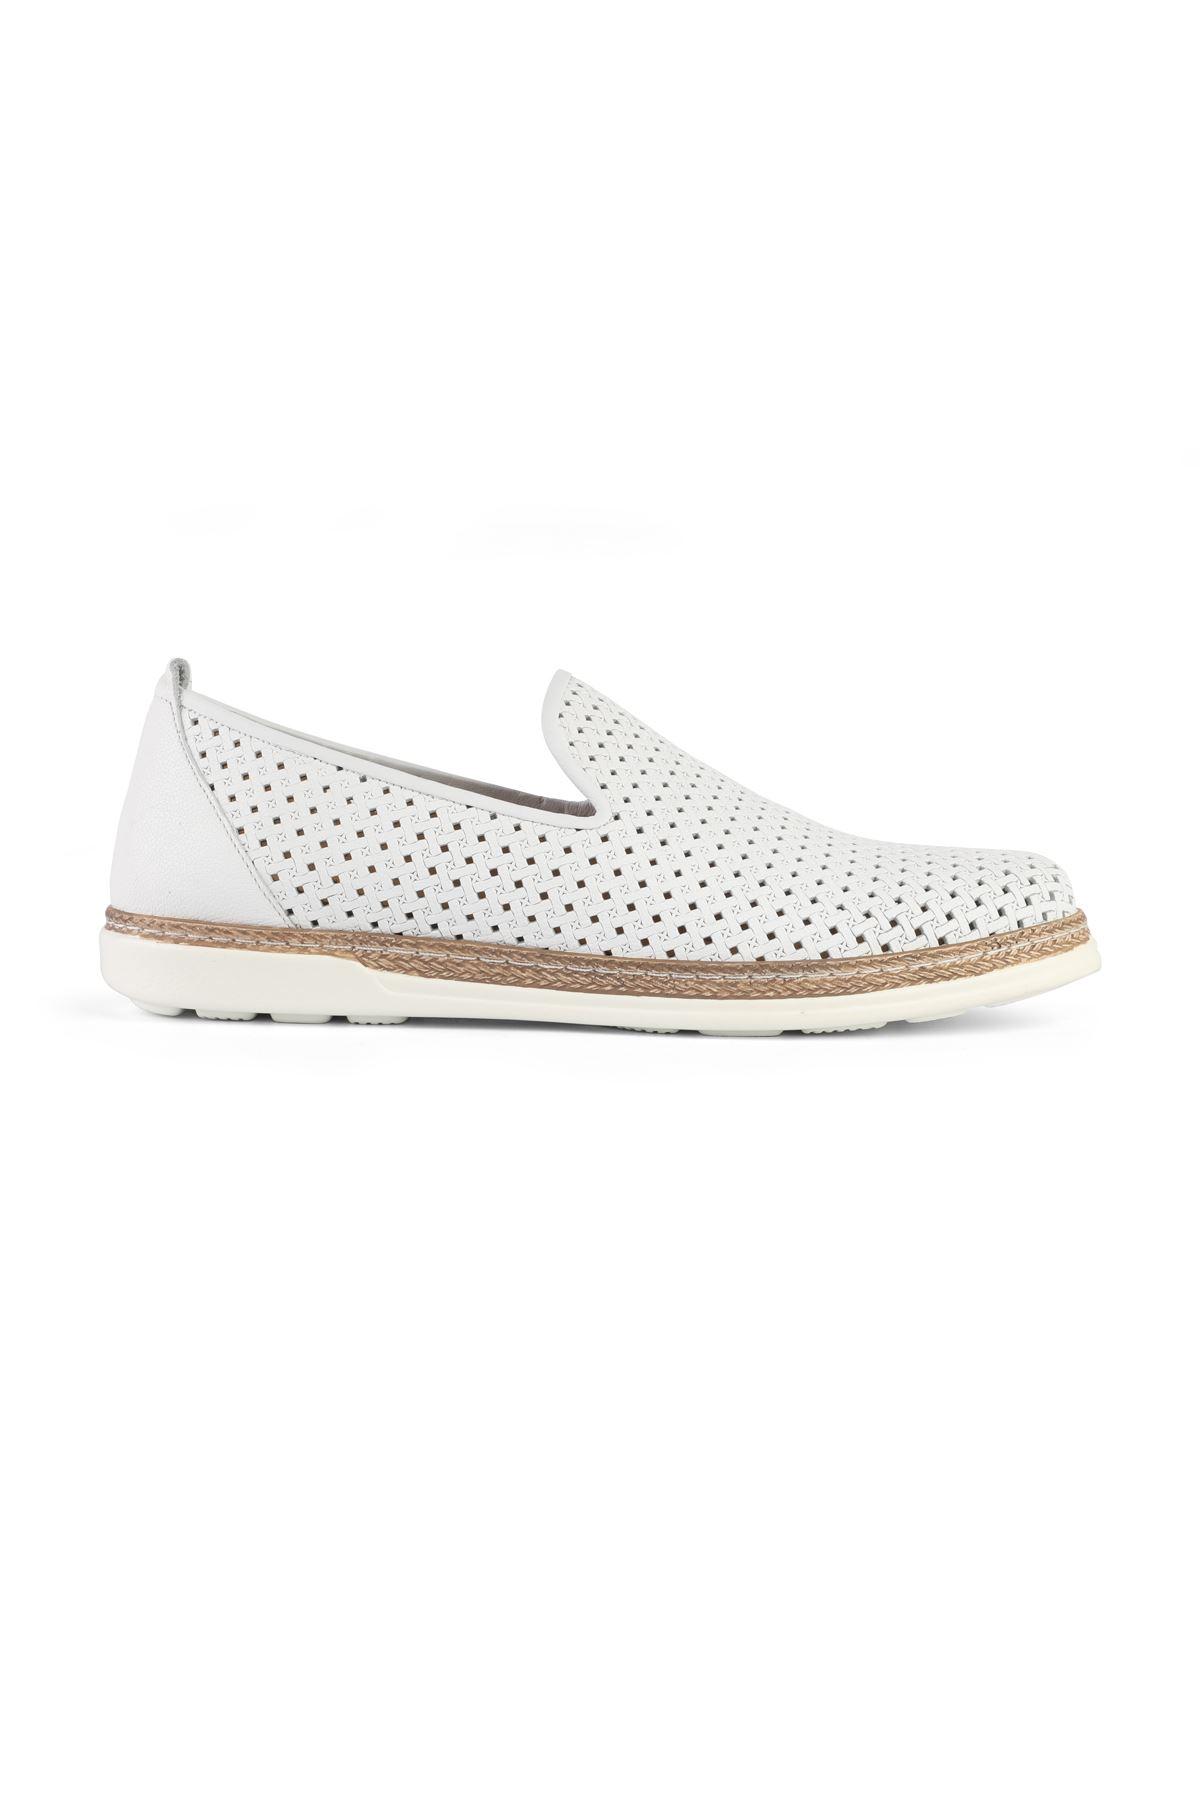 Libero 3397 White Loafer Shoes